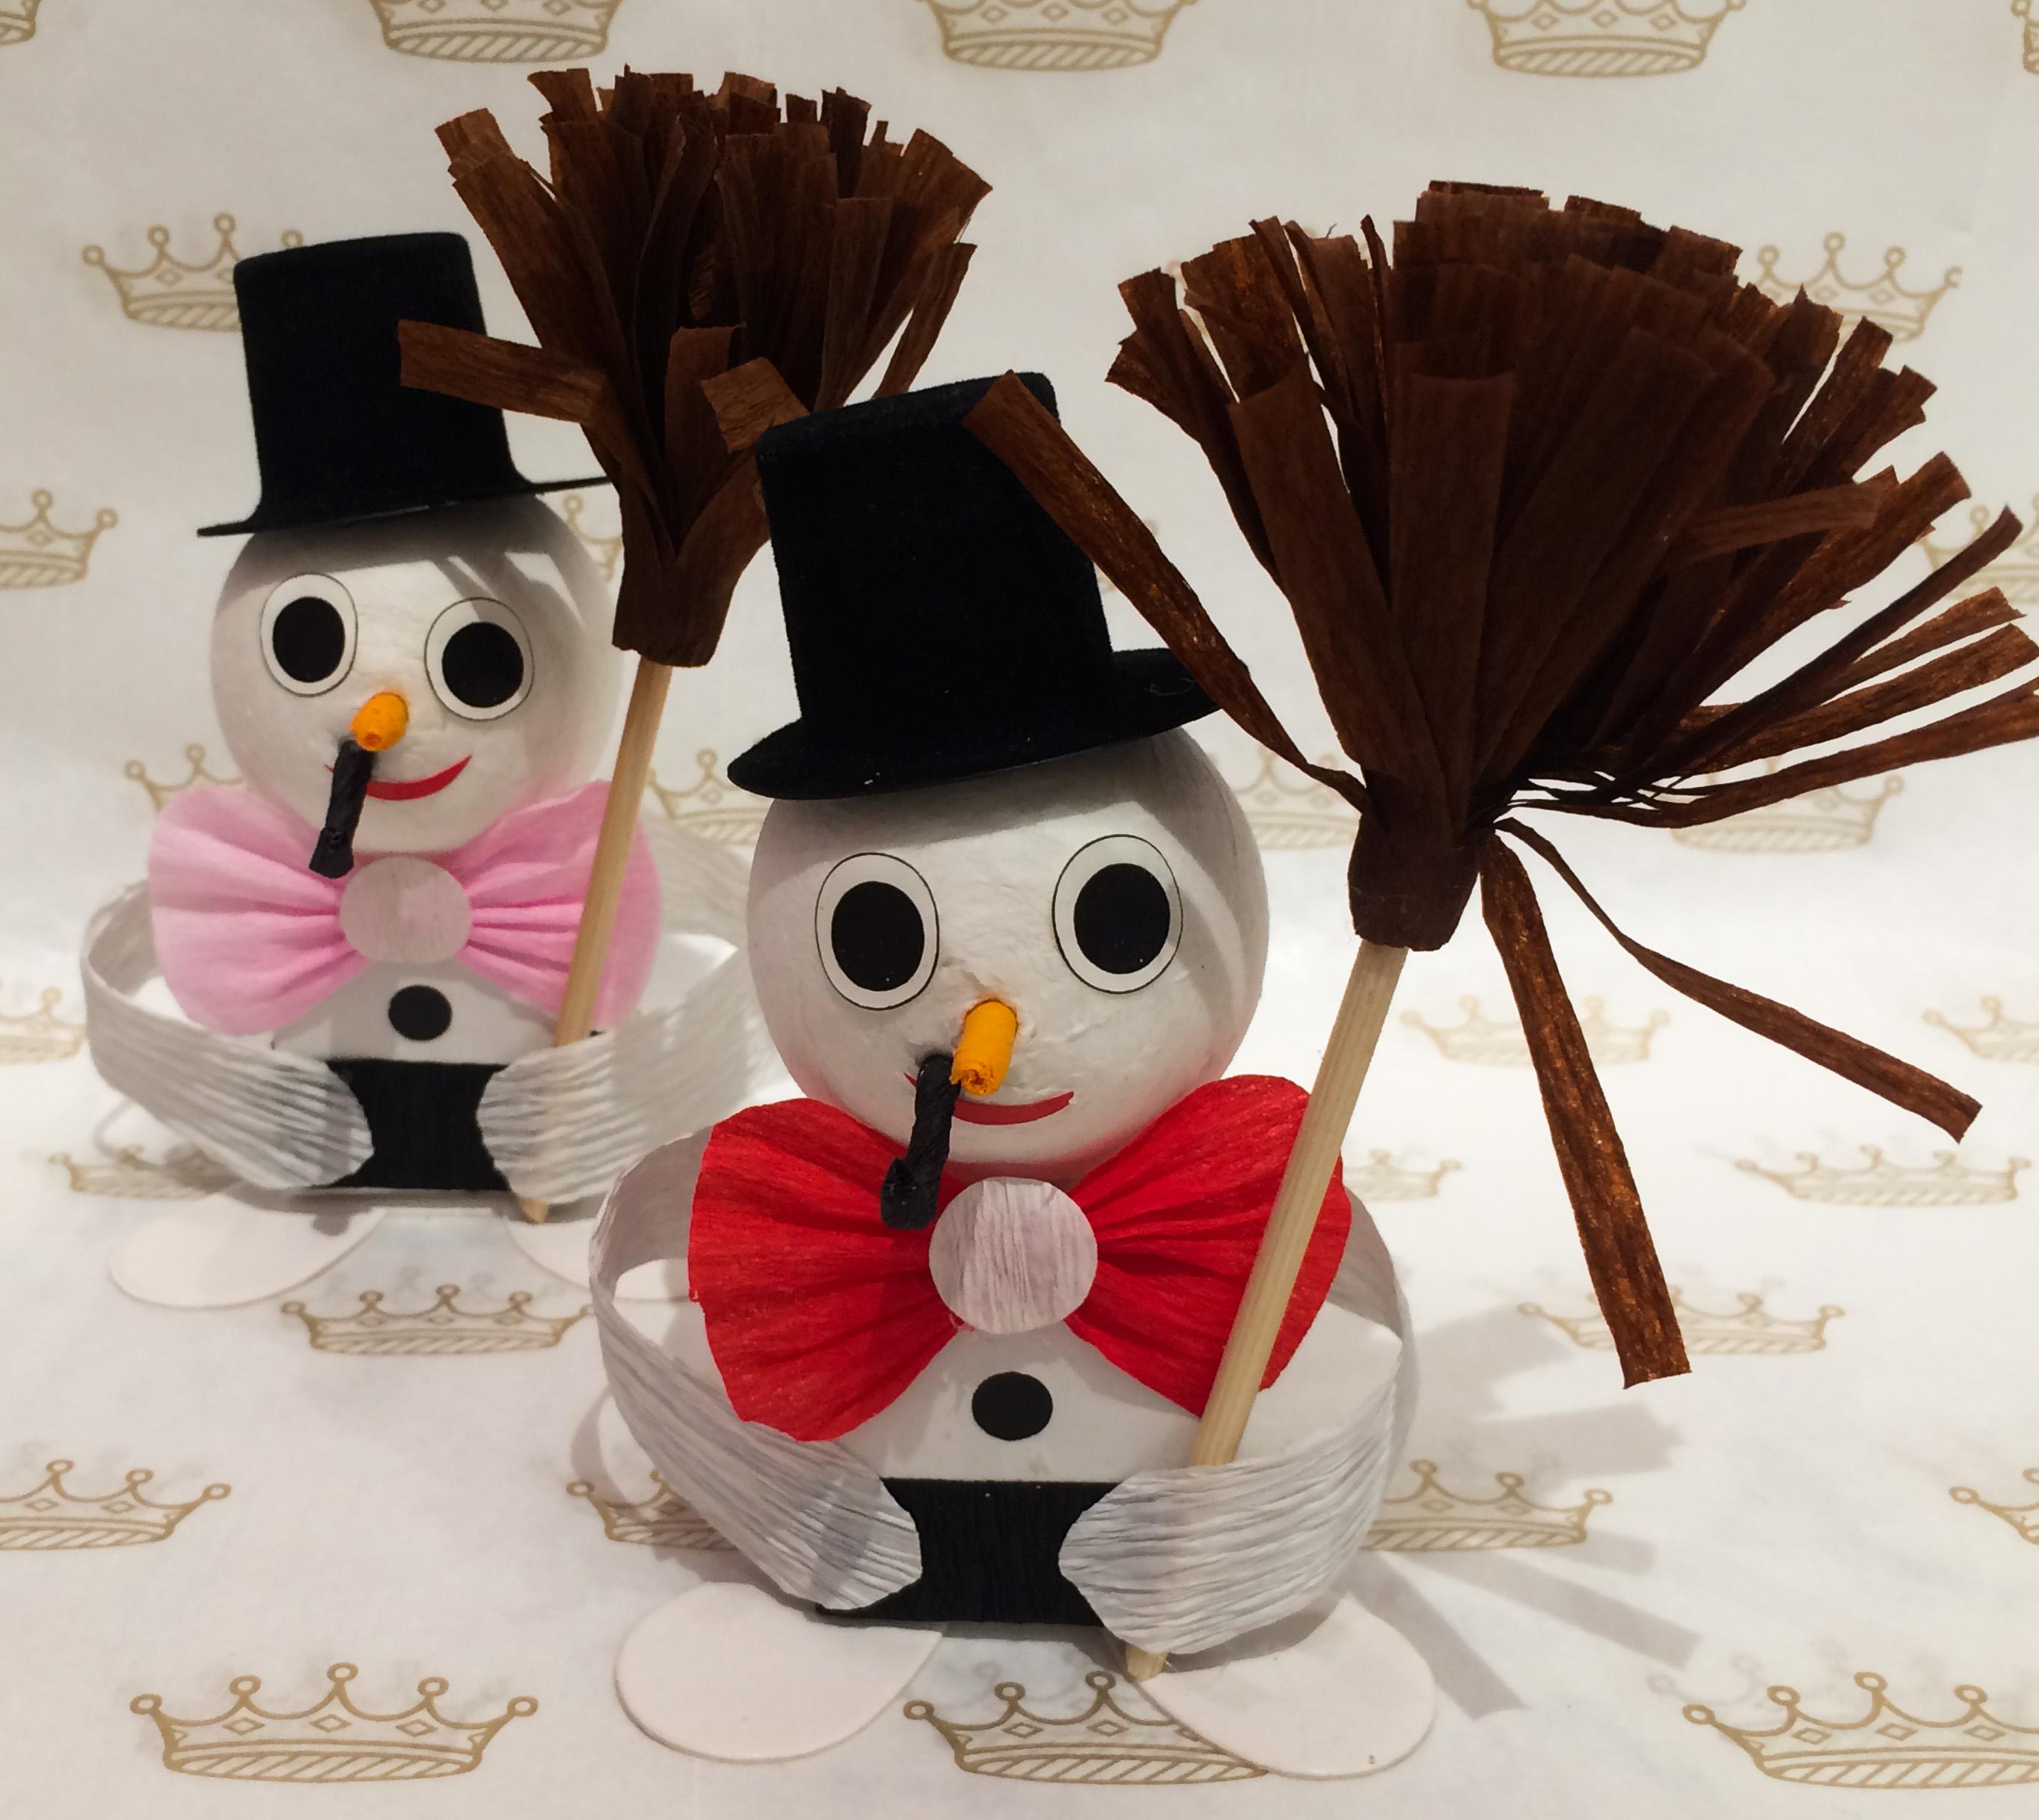 2-807a-snowman-coloers-1pc-.jpg